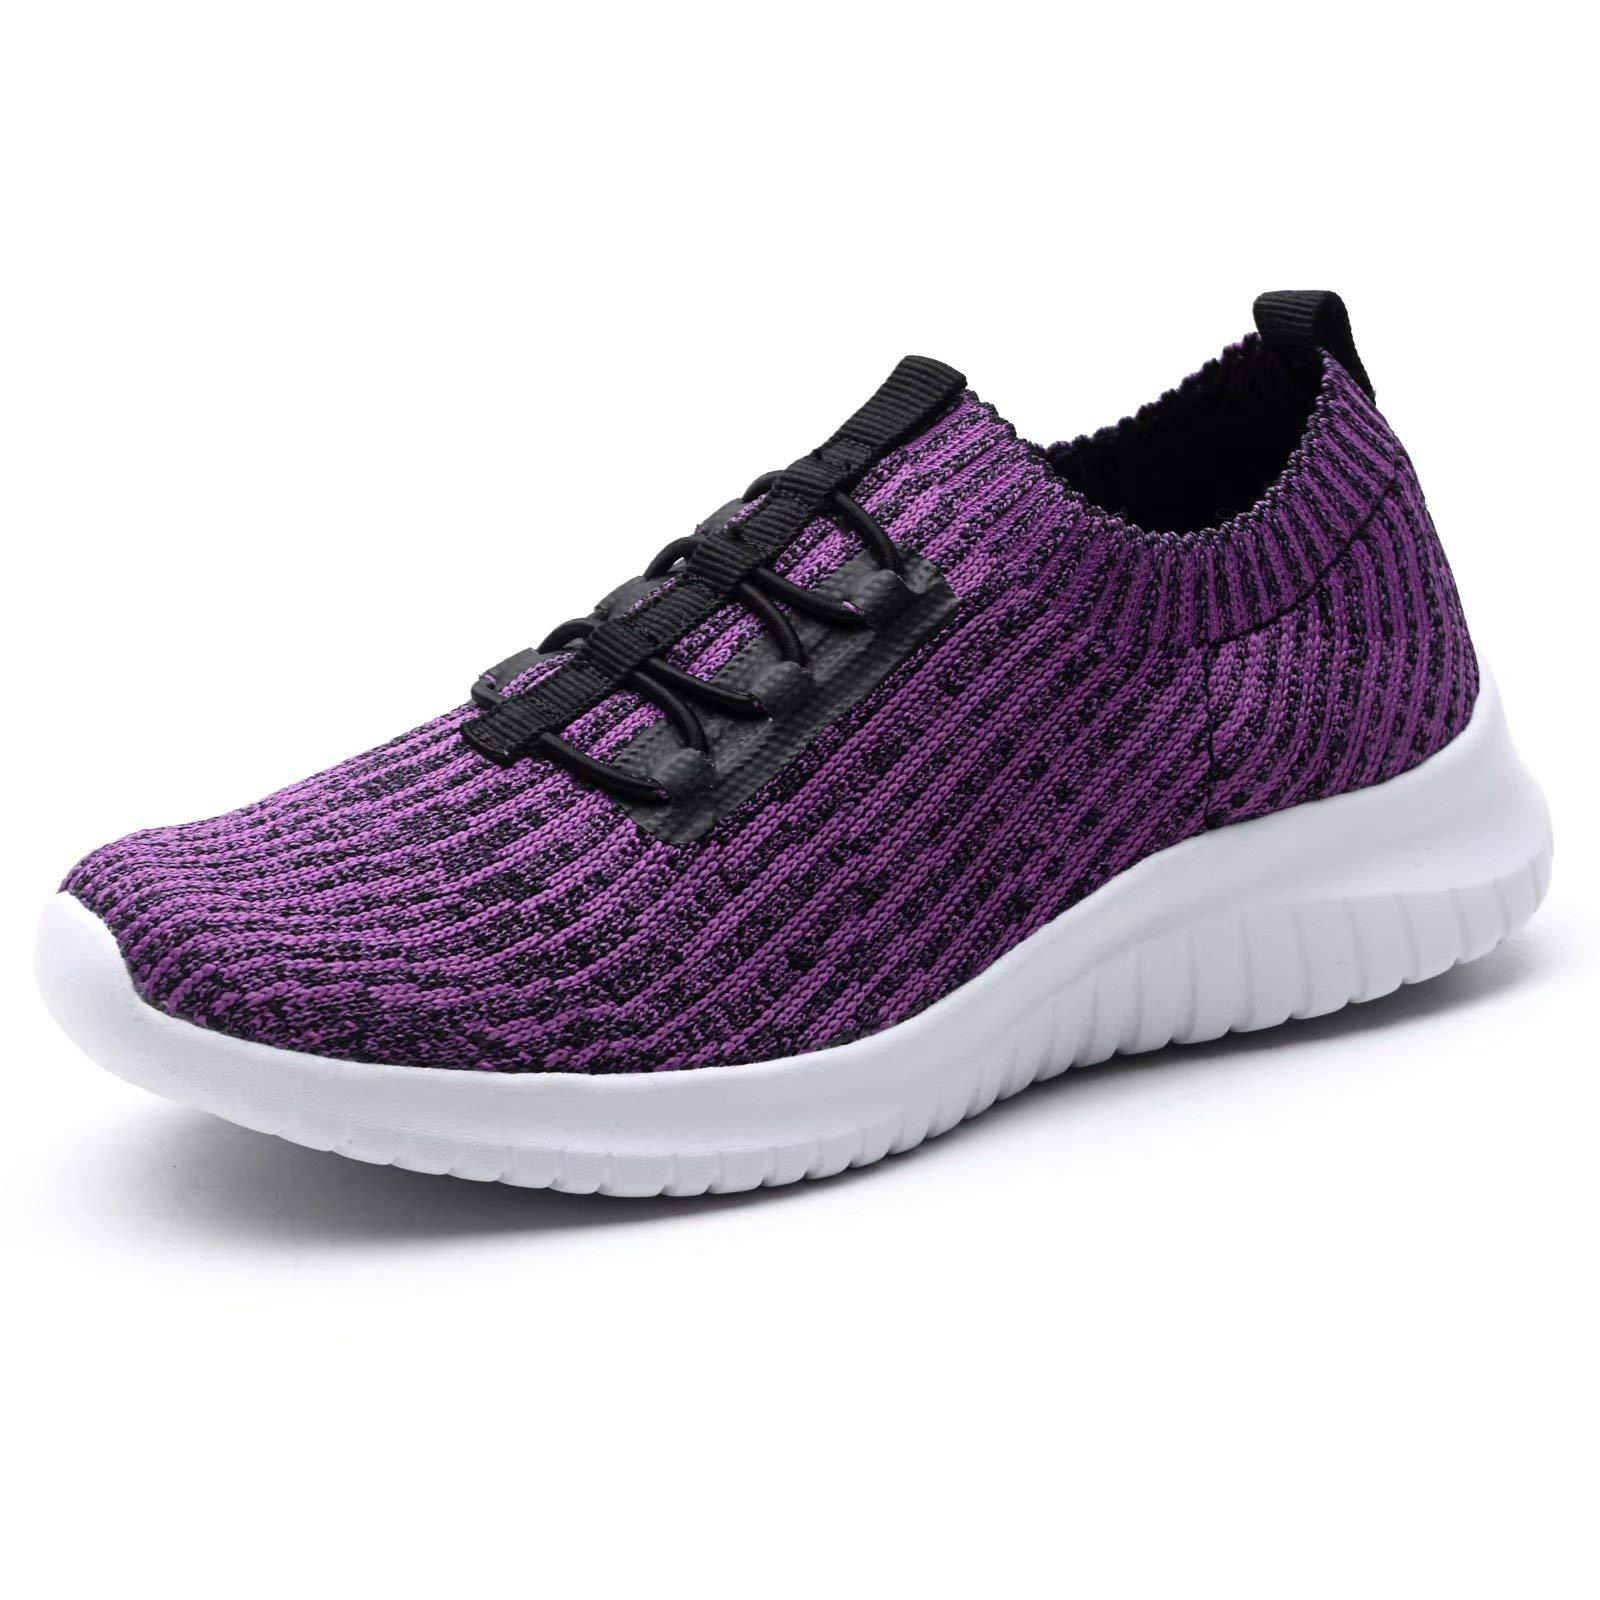 LANCROP Women's Athletic Walking Shoes - Casual Mesh Lightweight Running Slip On Sneakers